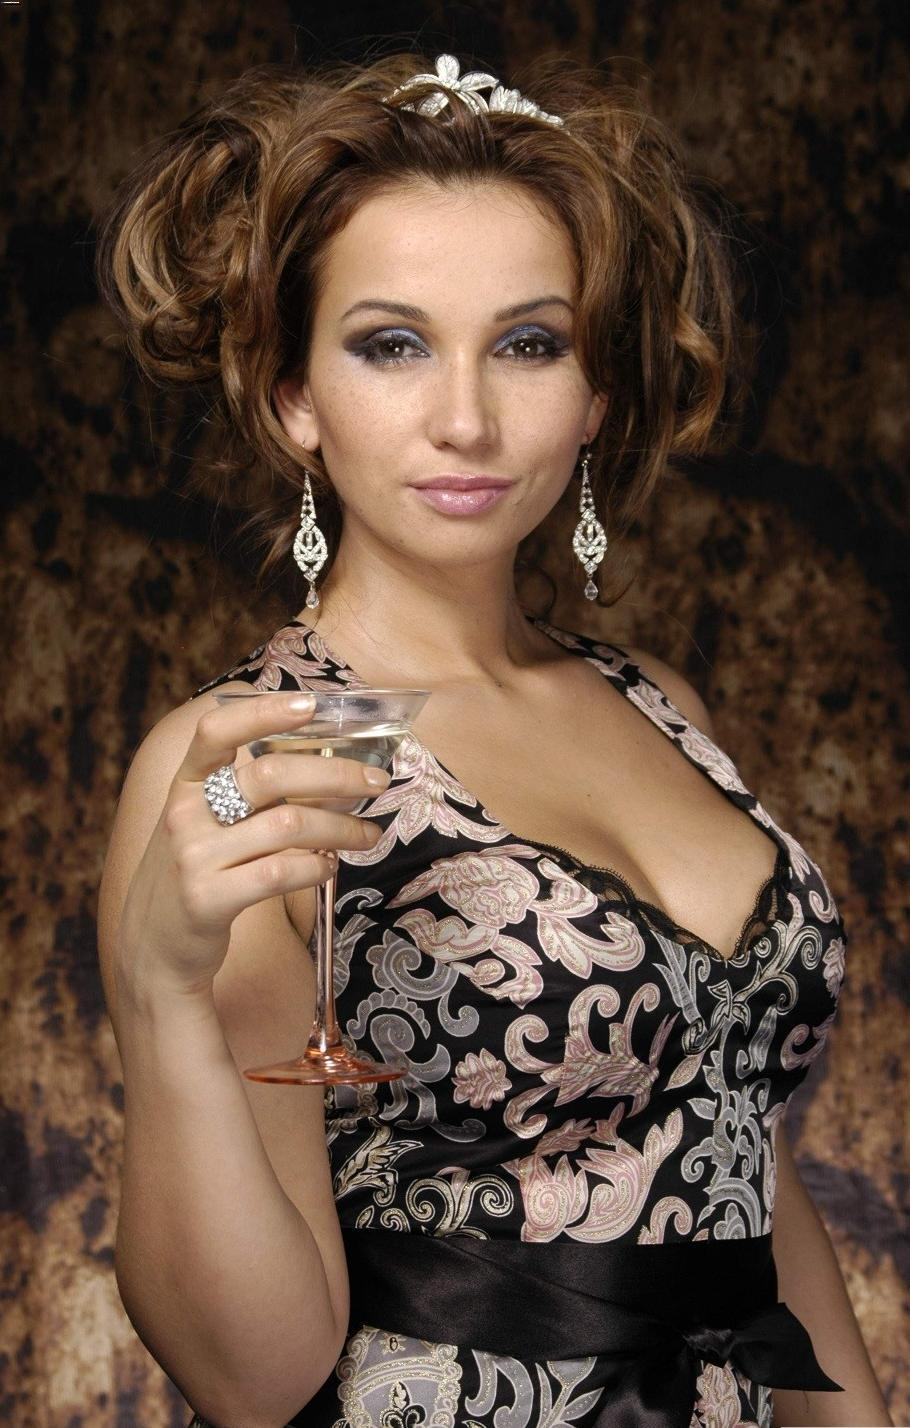 russkiy-seks-chat-virt